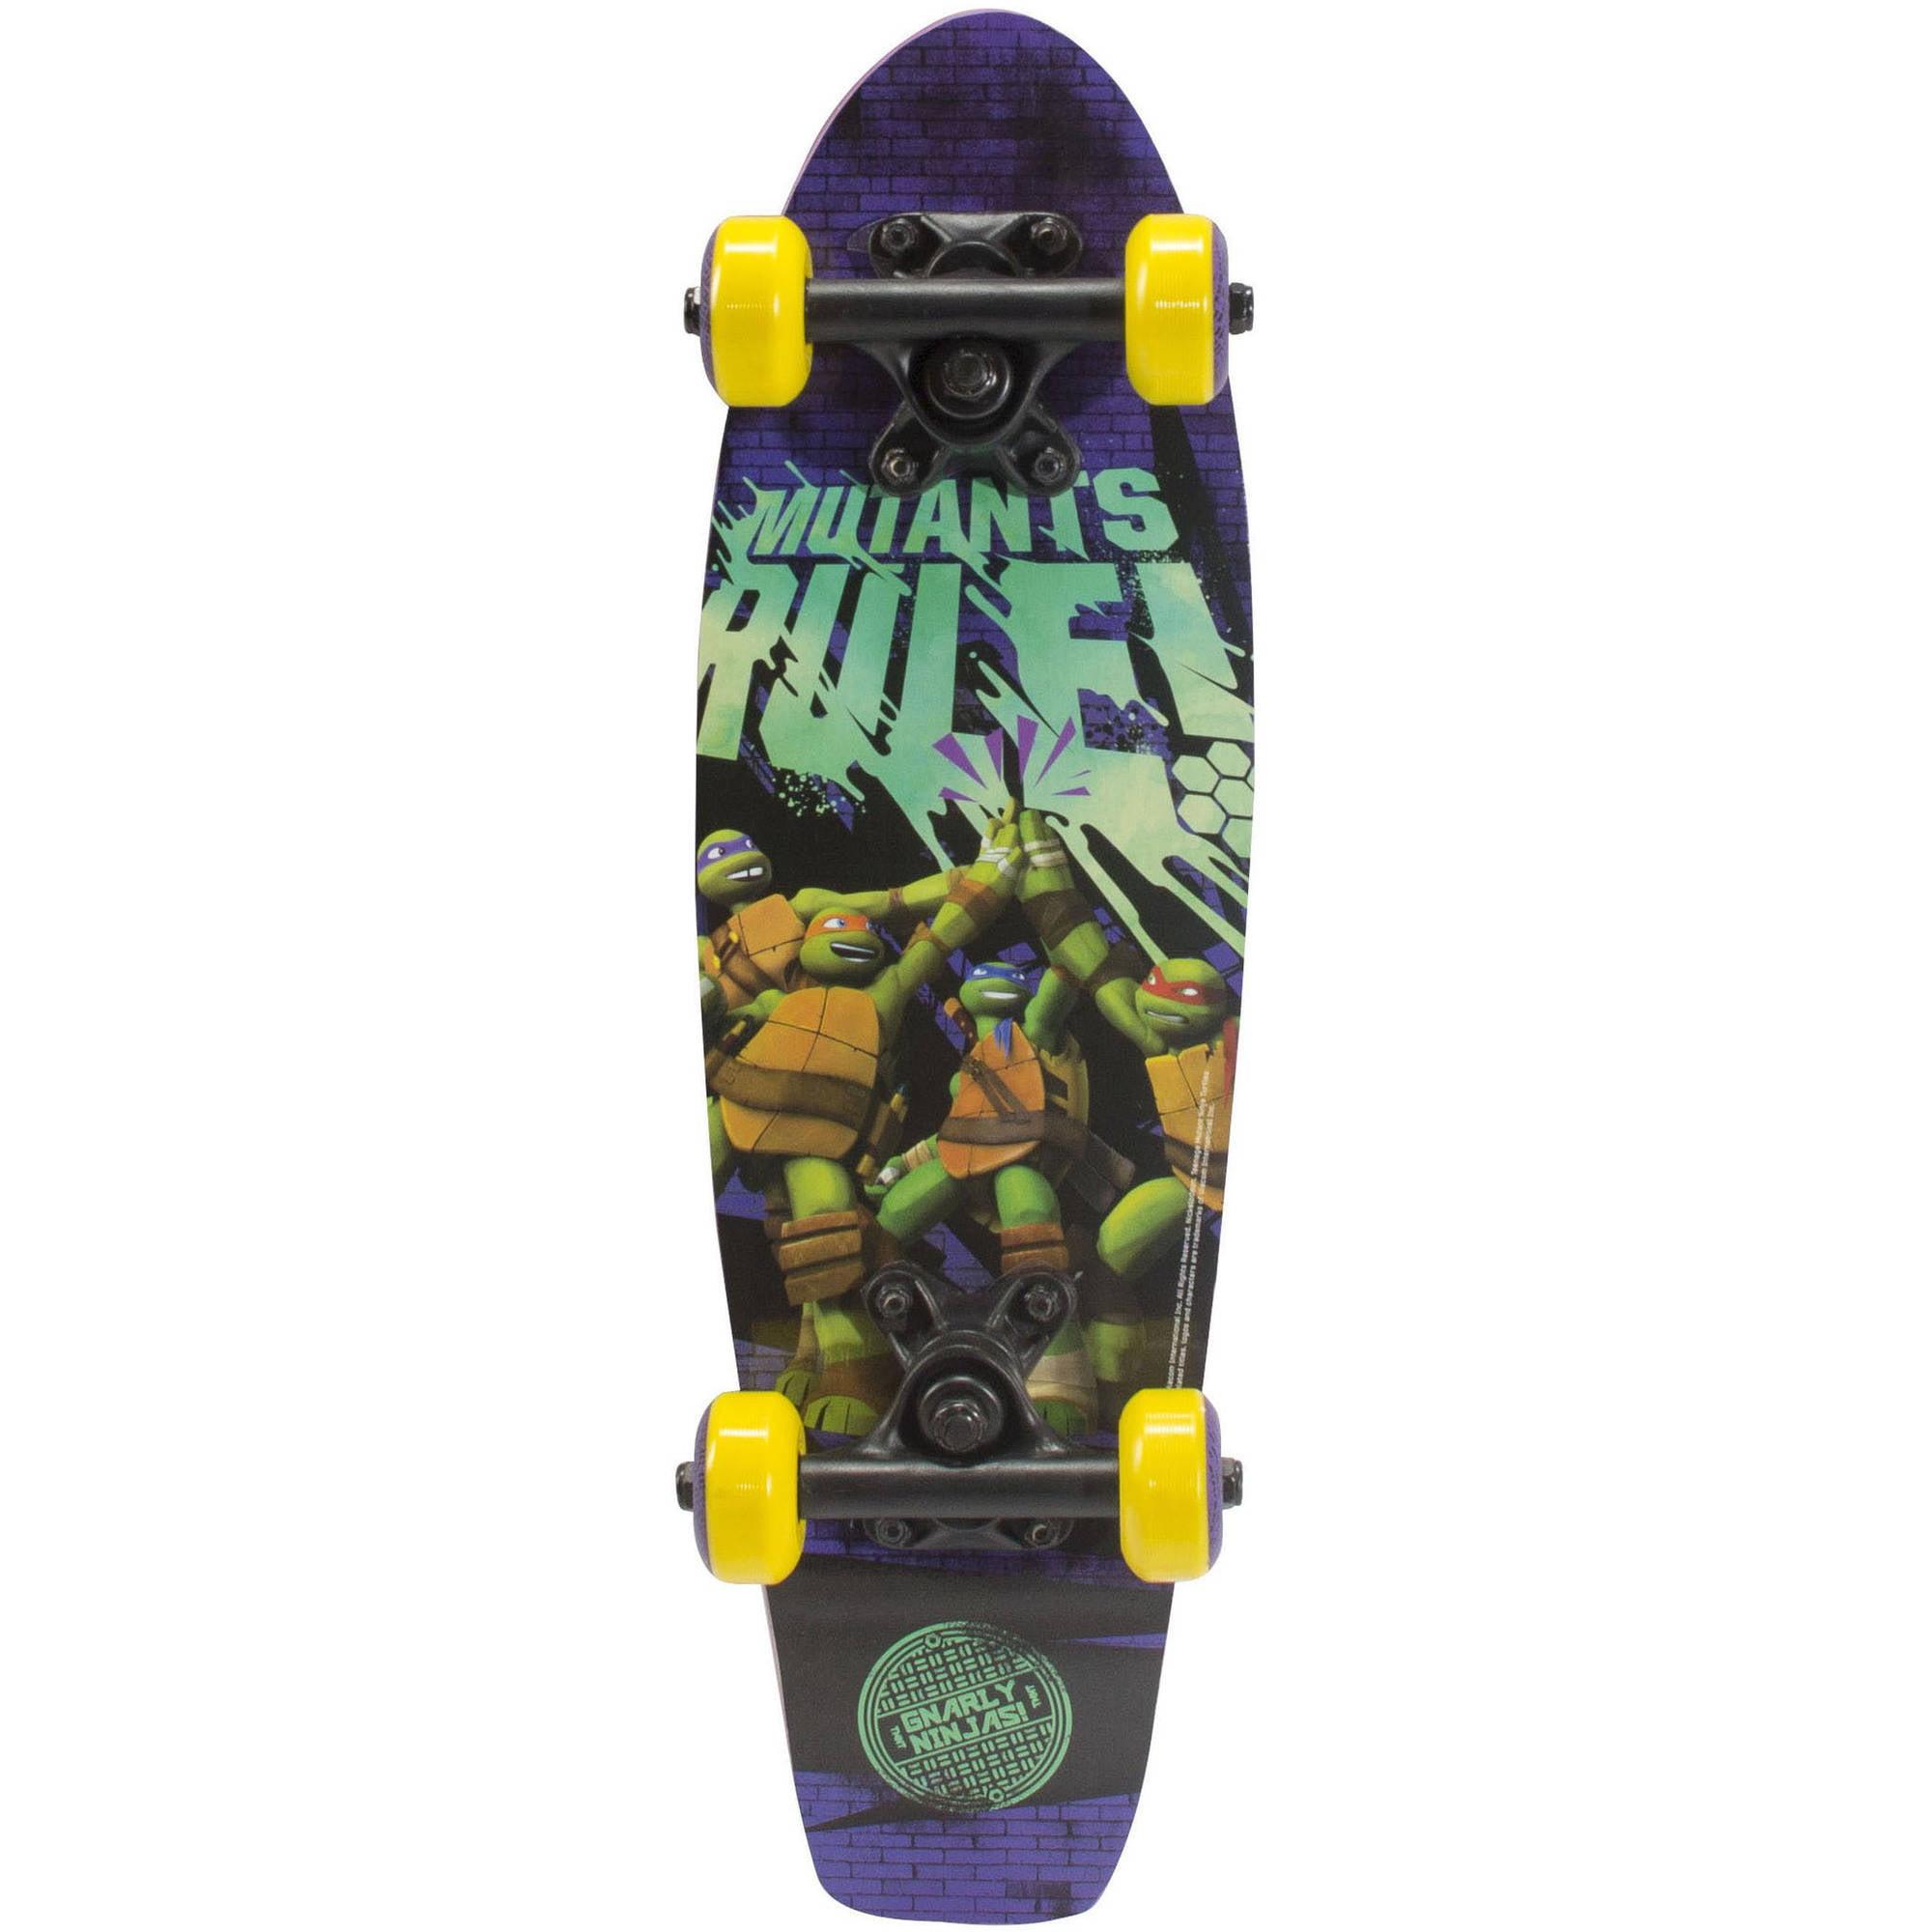 "Playwheels Boys Kids 21"" Complete Skateboard"